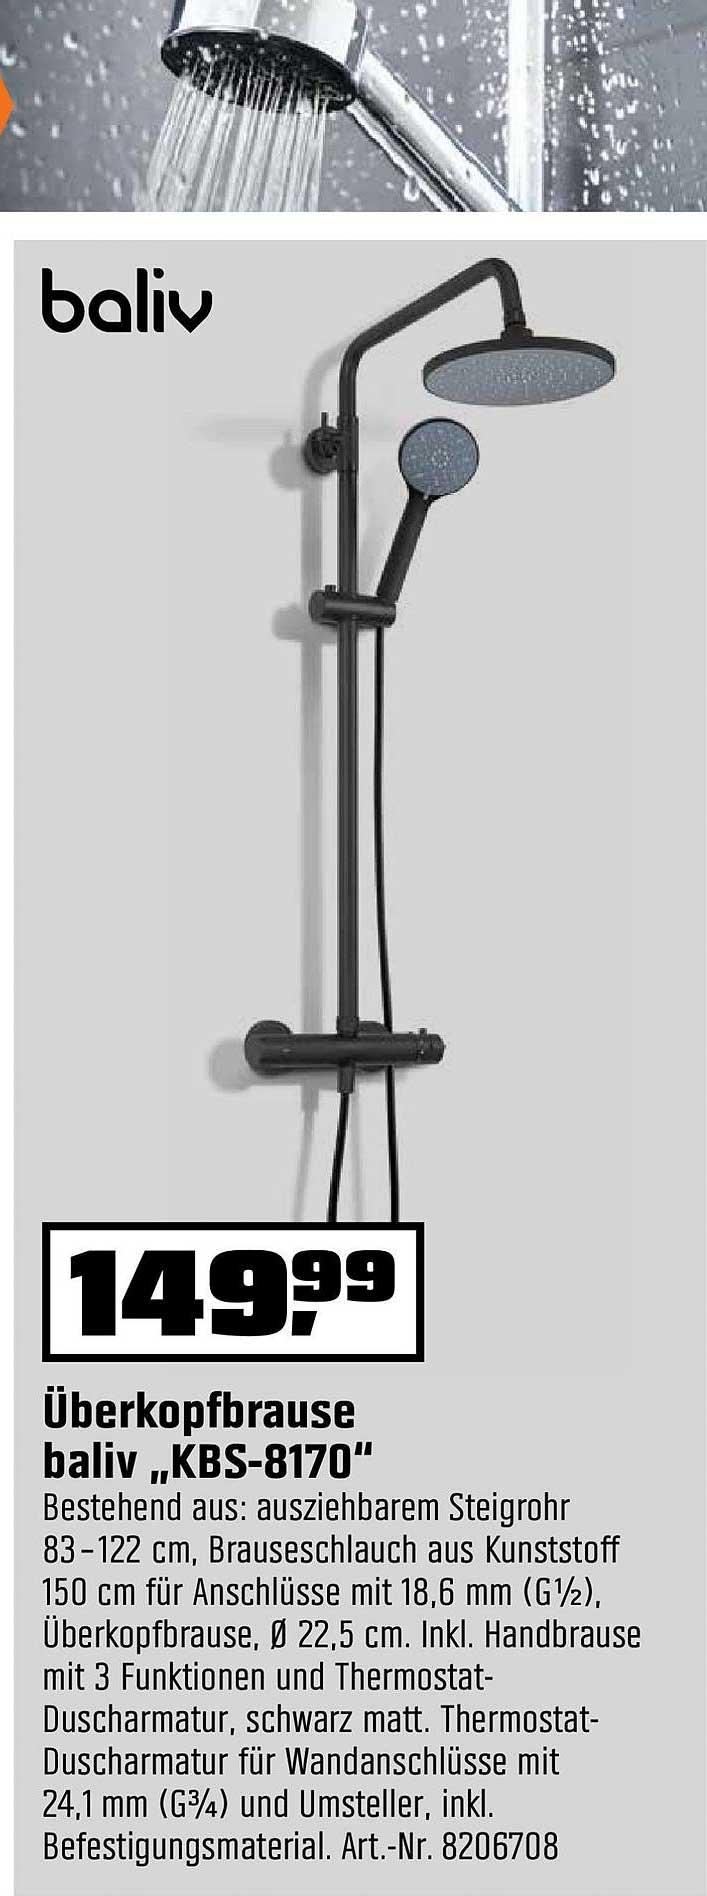 "OBI überkopfbrause Baliv ""kbs 8170"""